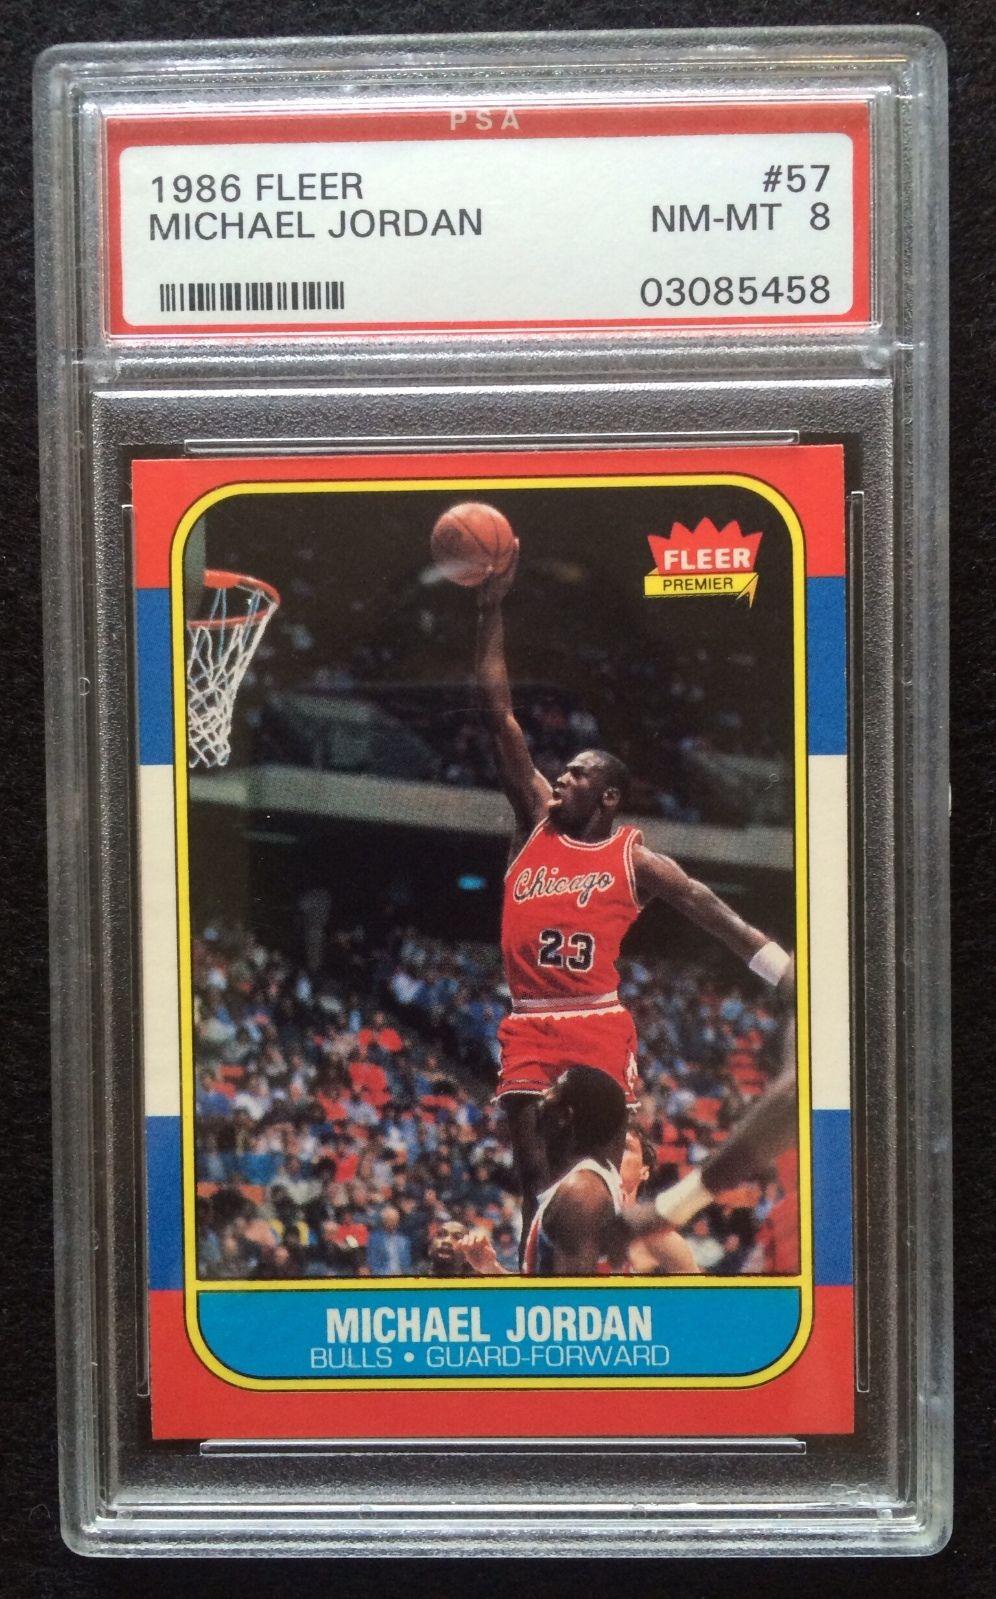 1986  1987 Fleer Michael Jordan Chicago Bulls 57 Basketball Rookie Card PSA 8